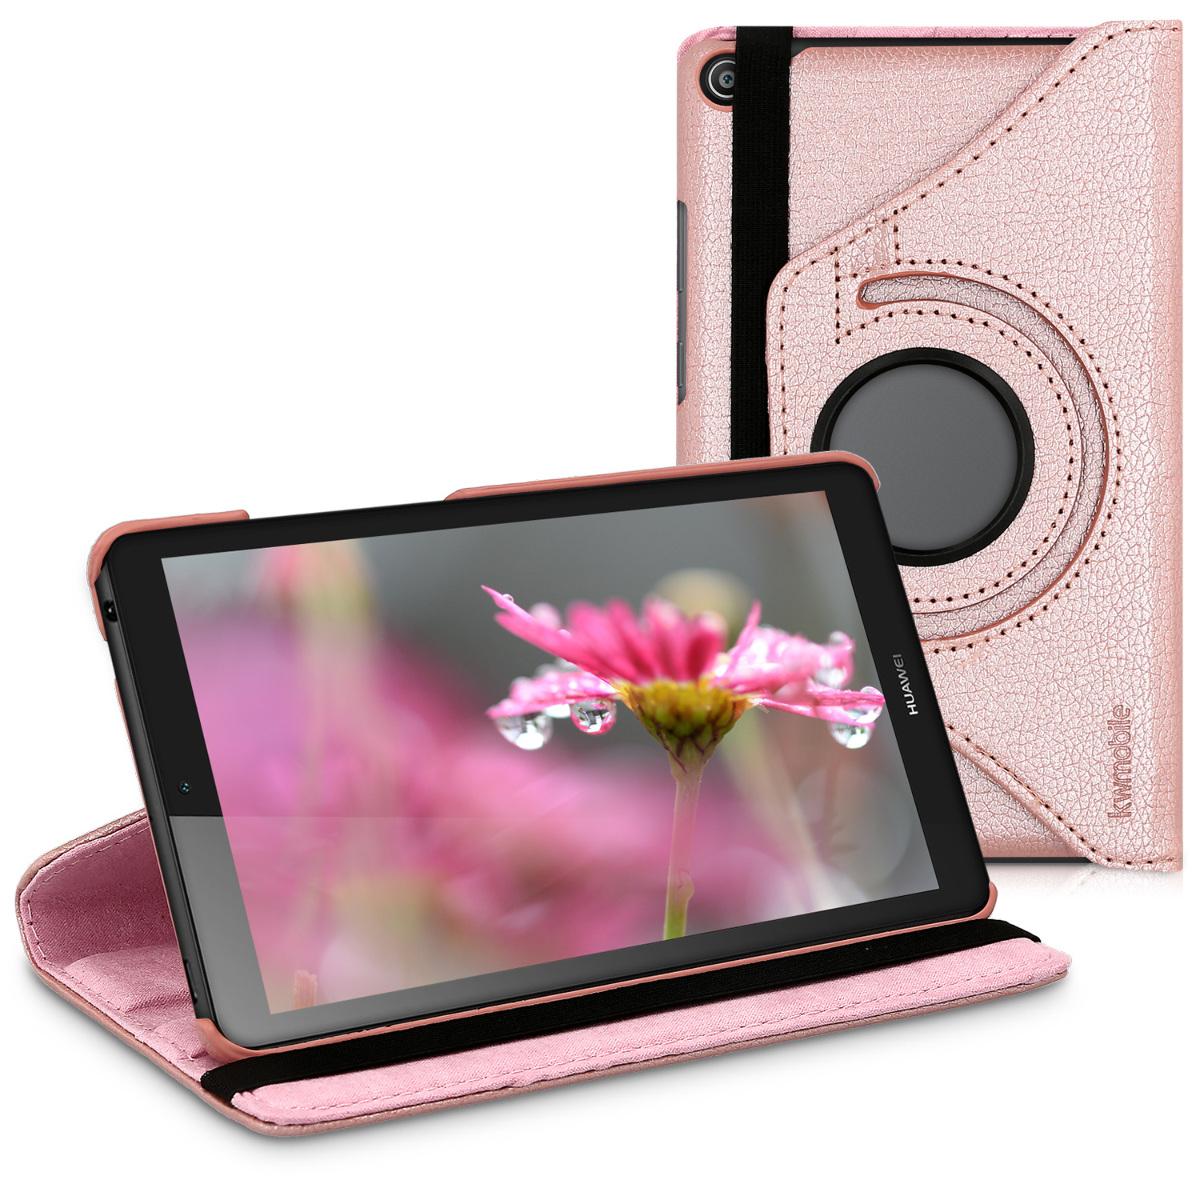 KW Θήκη 360° Huawei MediaPad T3 7.0 - Συνθετικό Δέρμα - Rose Gold (43161.81)